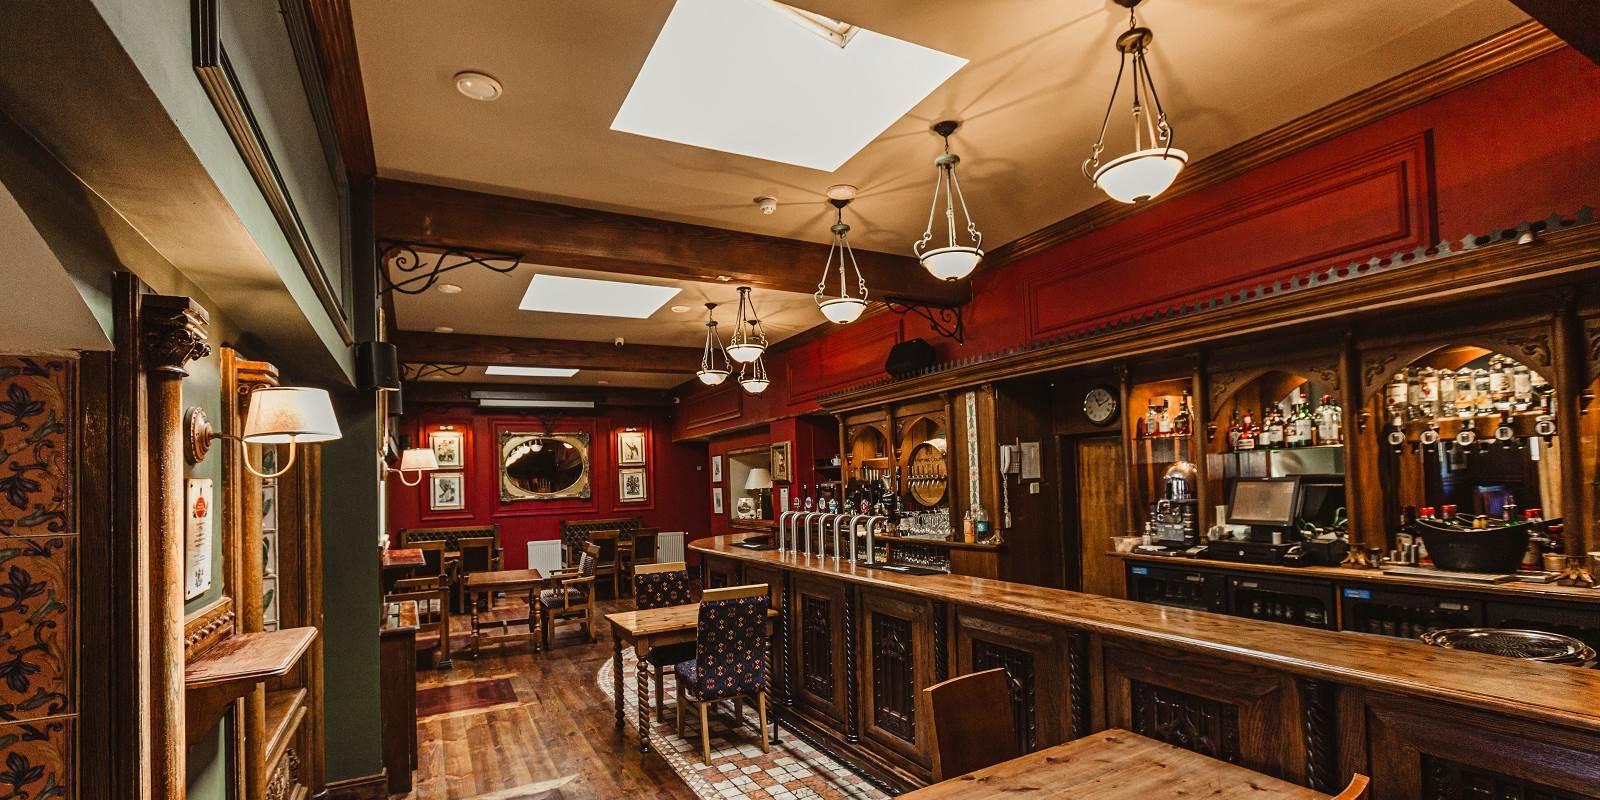 Murtys Bar